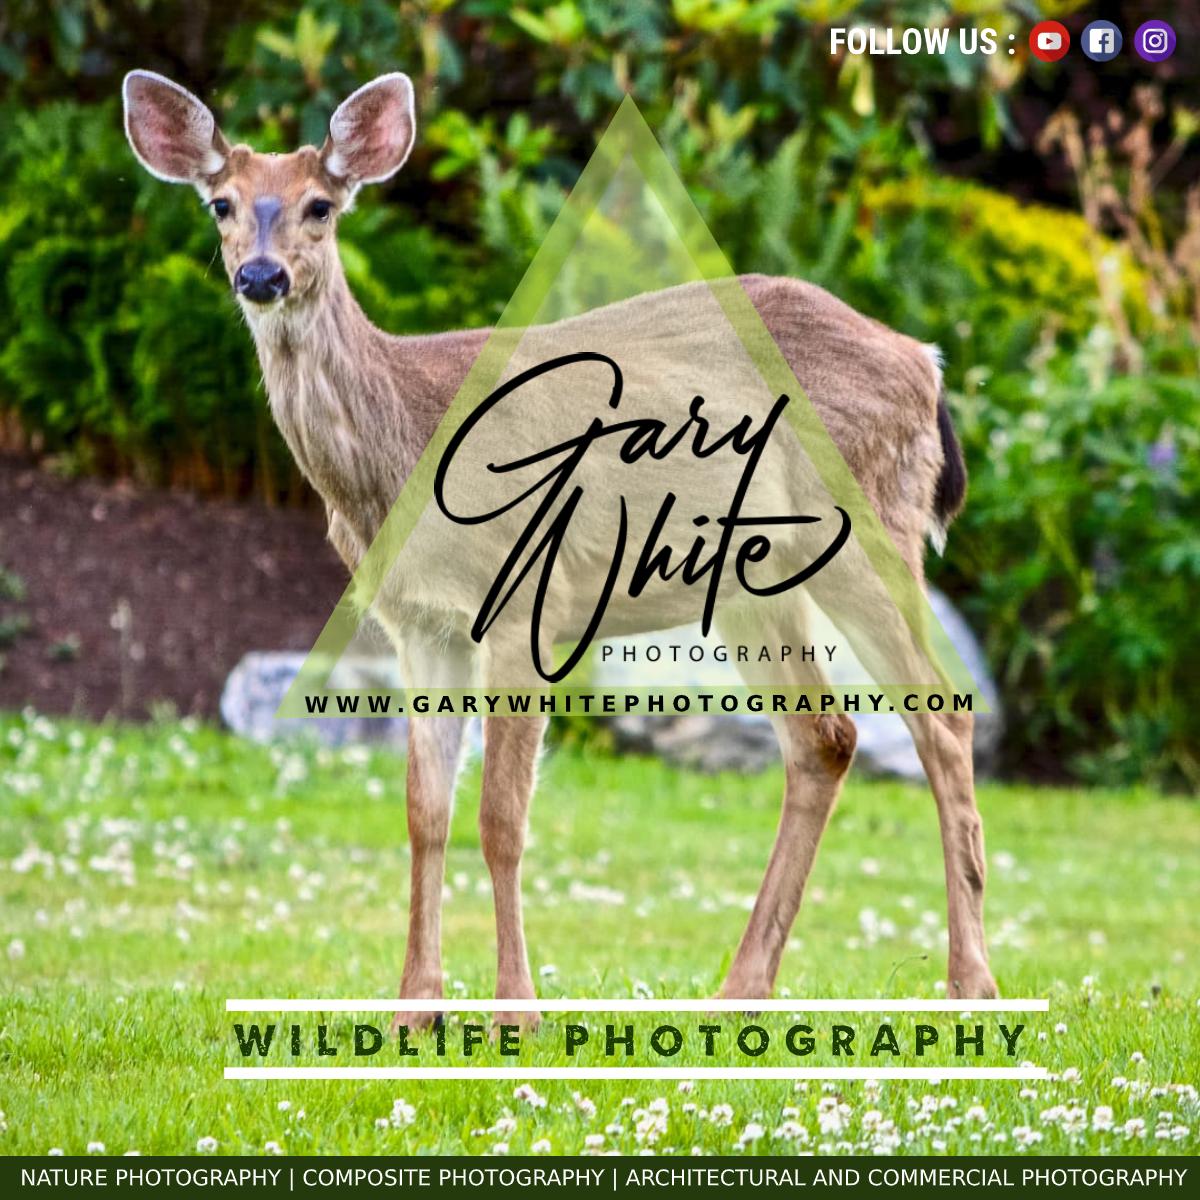 Gary White Photography Australia